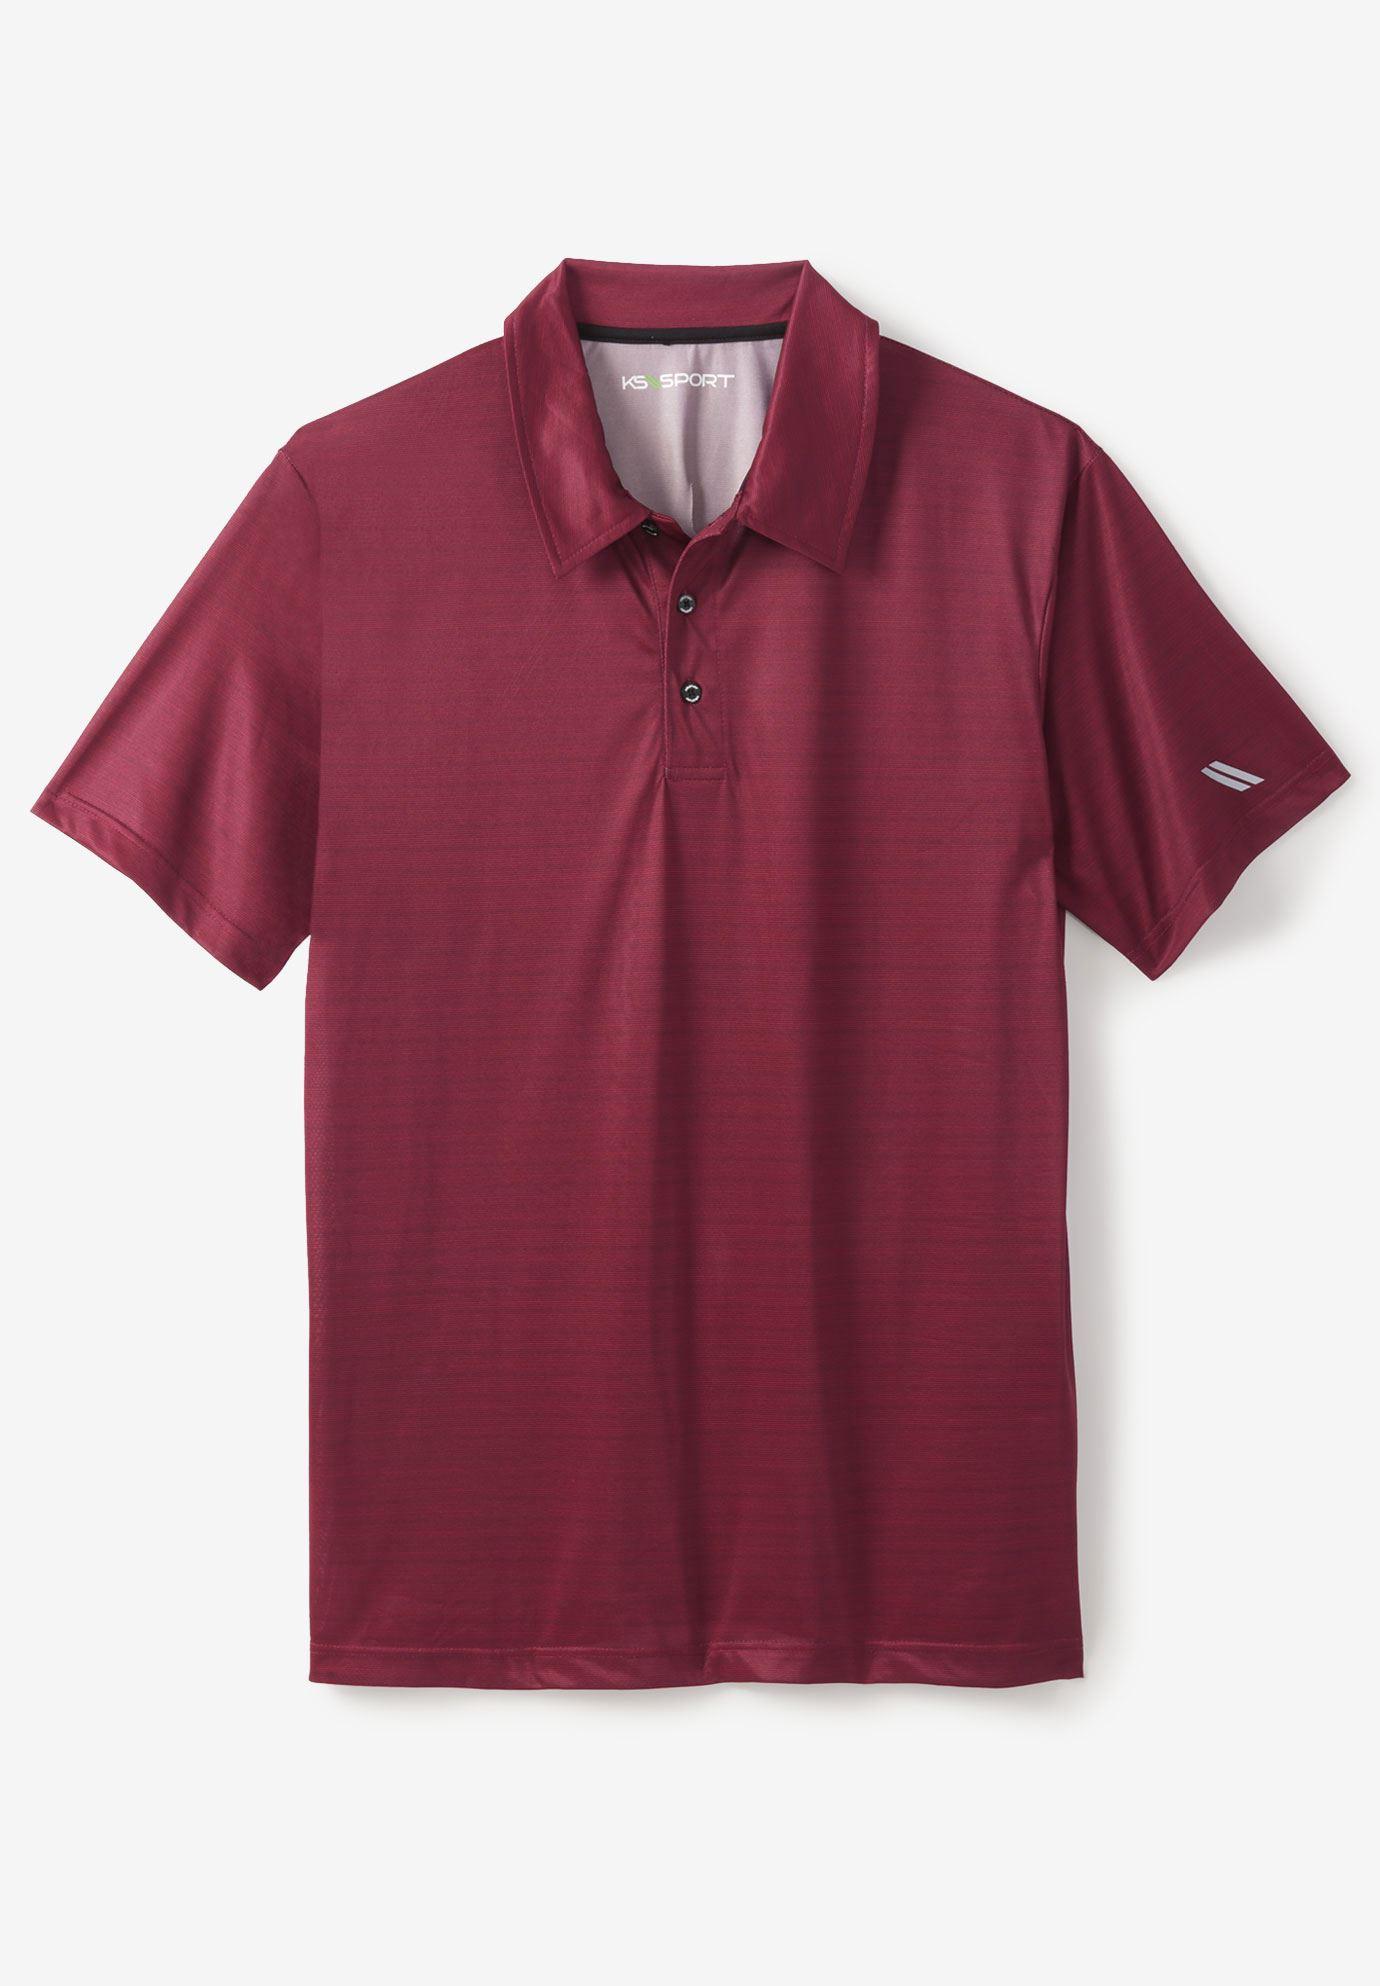 e7a11263 Golf Polo by KS Sport™ | Plus Size Activewear | Full Beauty